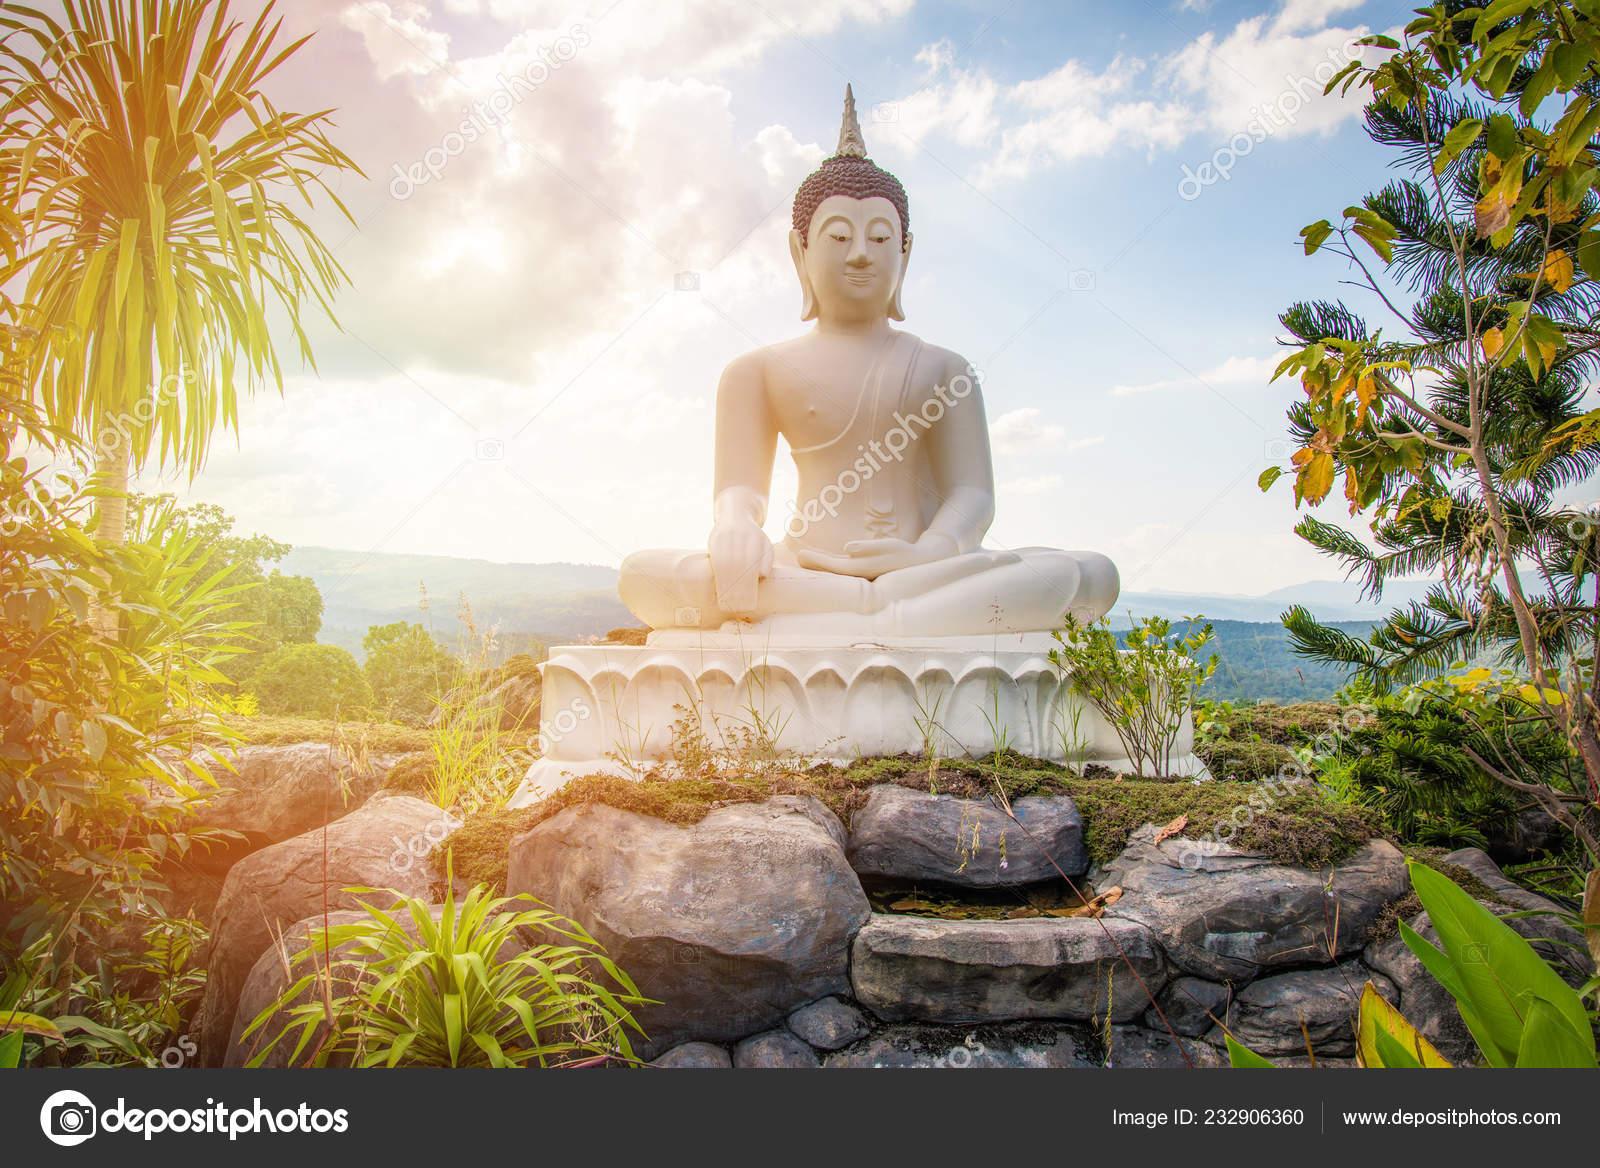 Garden Buddha Statue Buddha Statue White Rock Hill Landscape Statue Stock Photo Image By C Poringdown Gmail Com 232906360